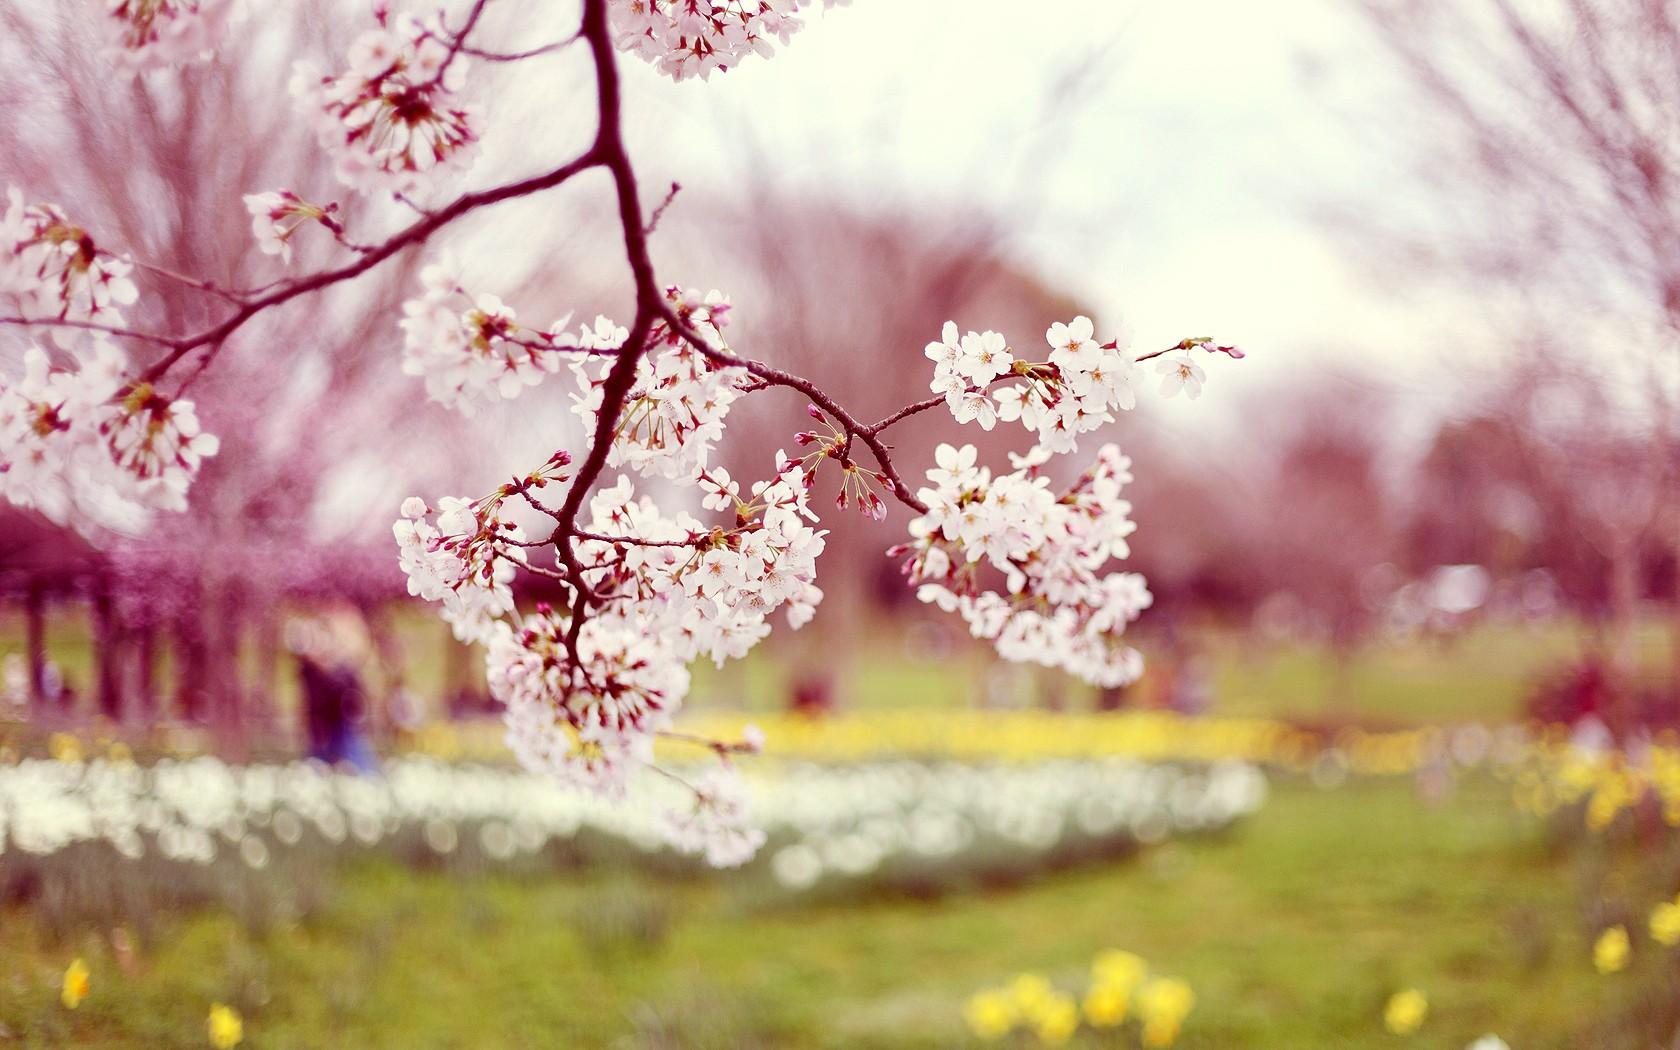 Flowers Spring Season Wallpaper Desktop Wallpaper with 1680x1050 1680x1050